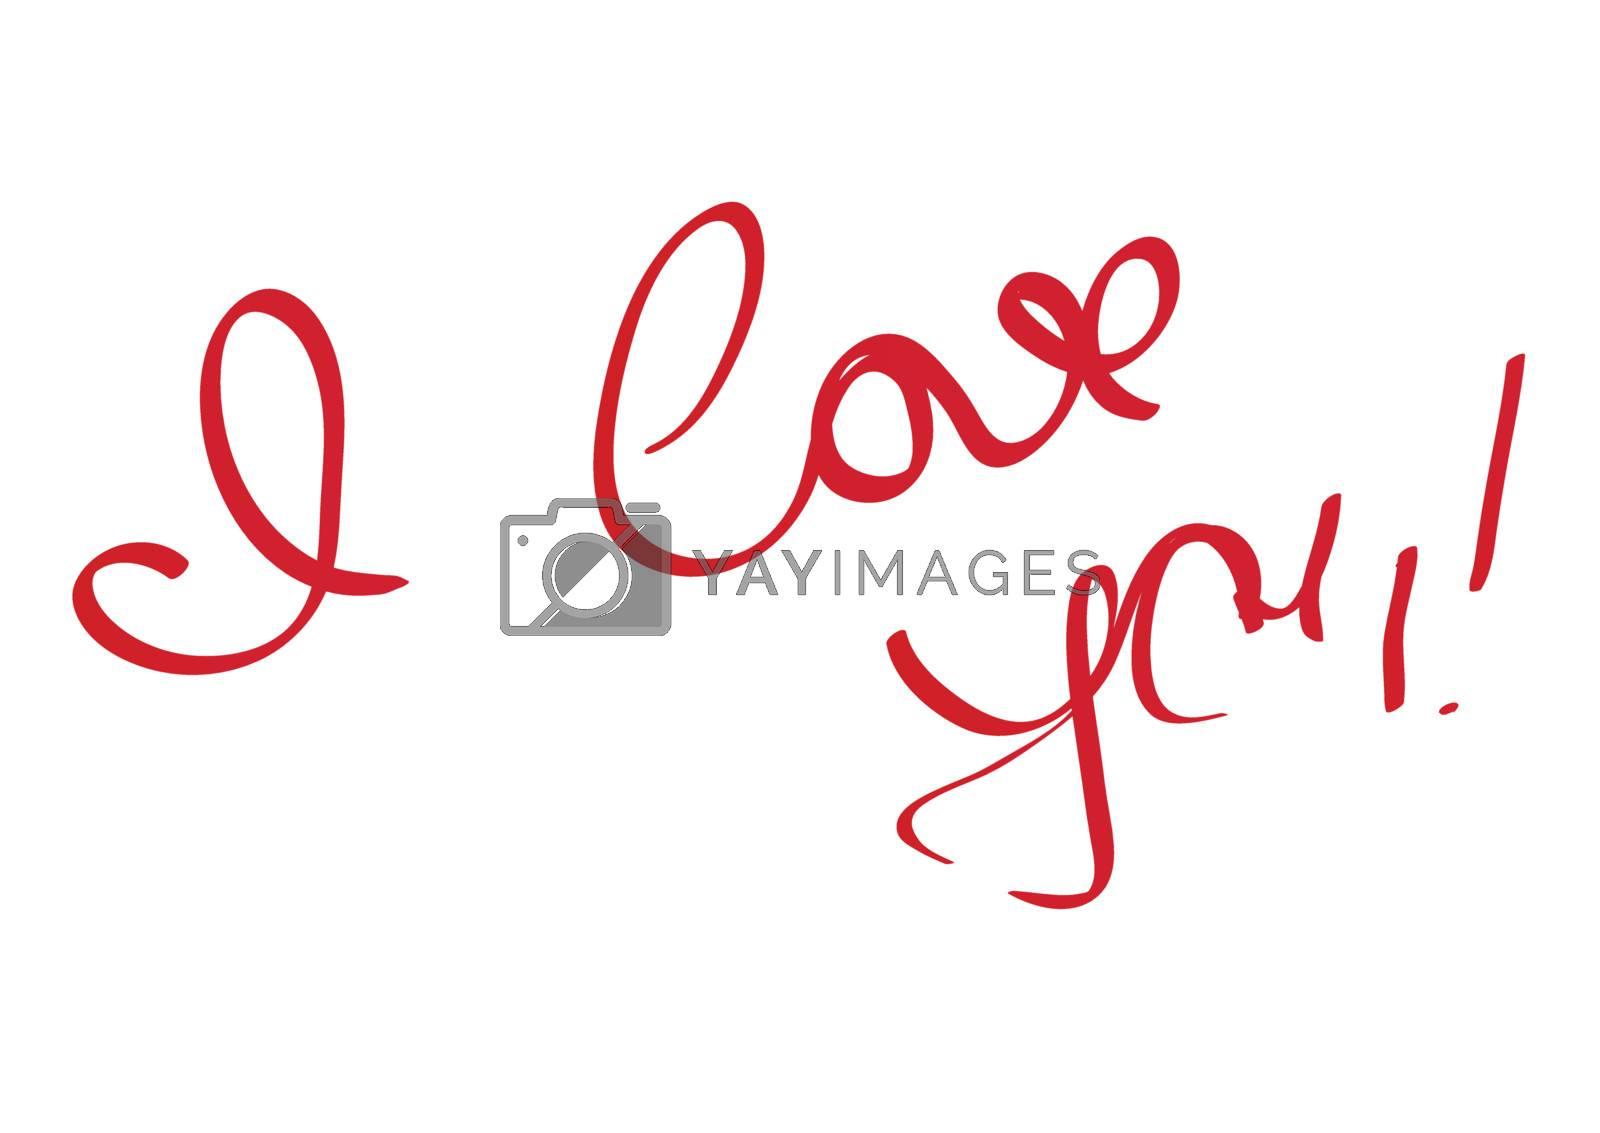 I Love You handwriting message